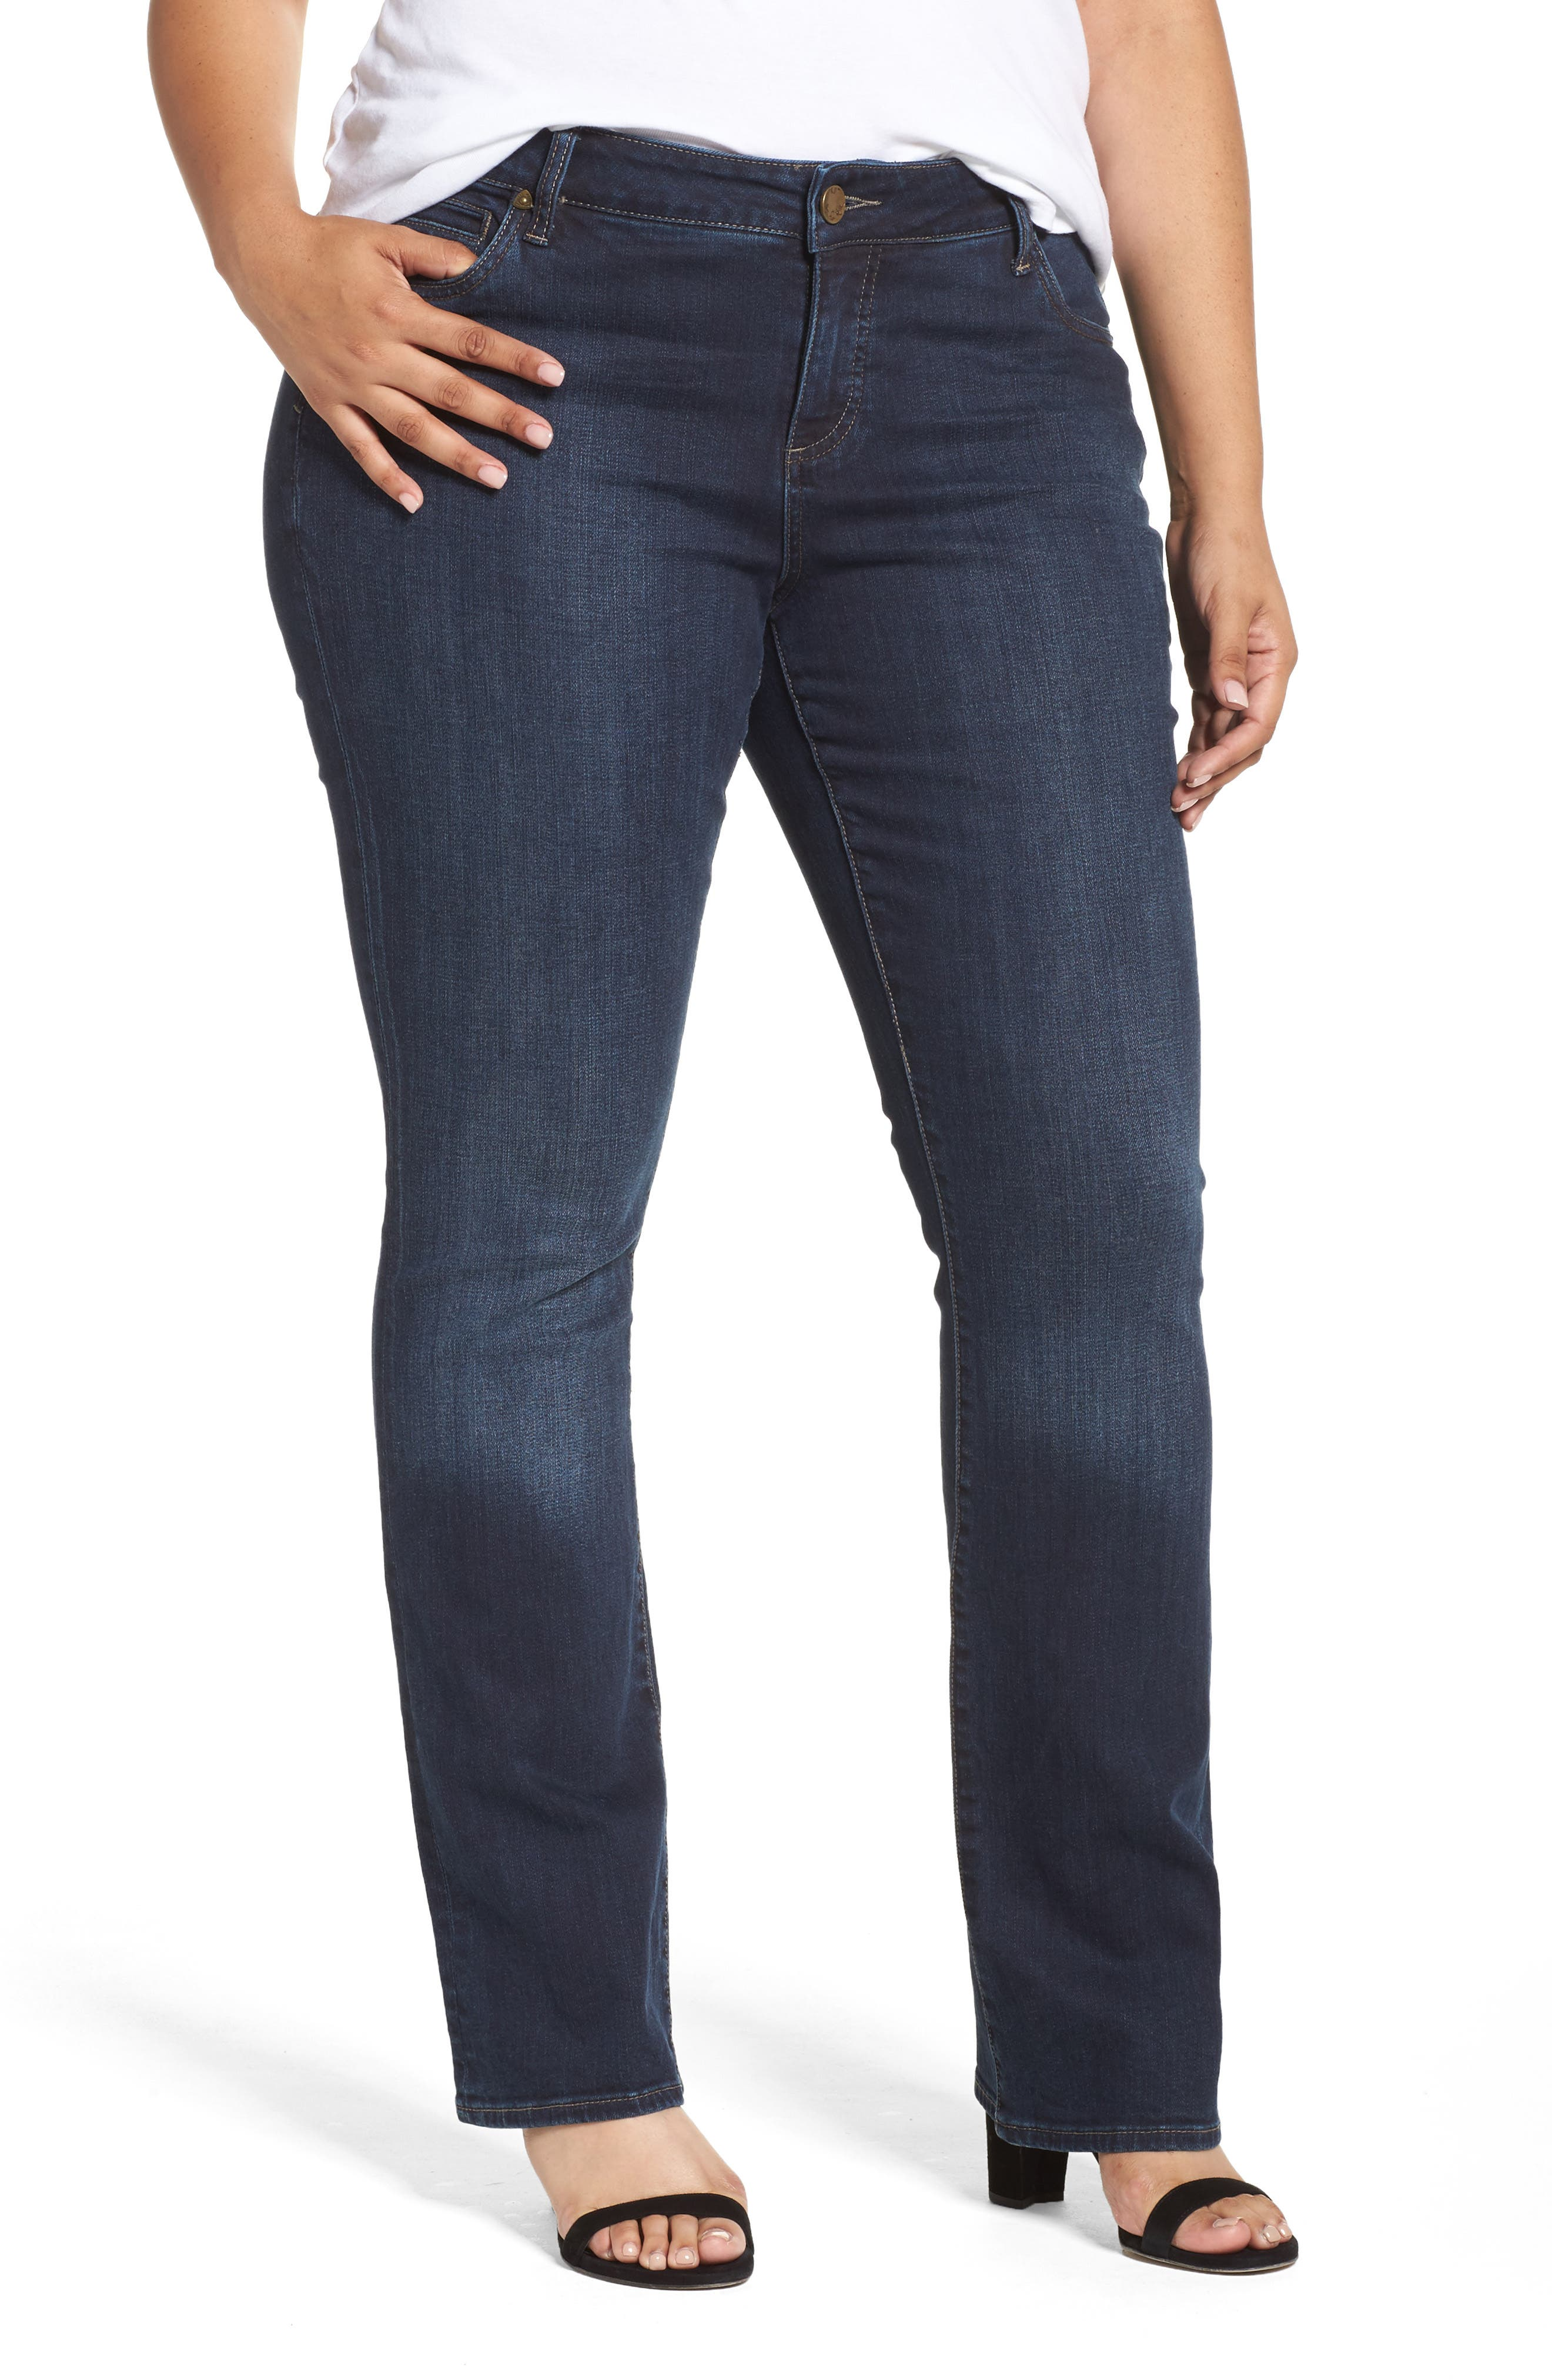 Natalie High Waist Bootcut Jeans,                             Main thumbnail 1, color,                             453